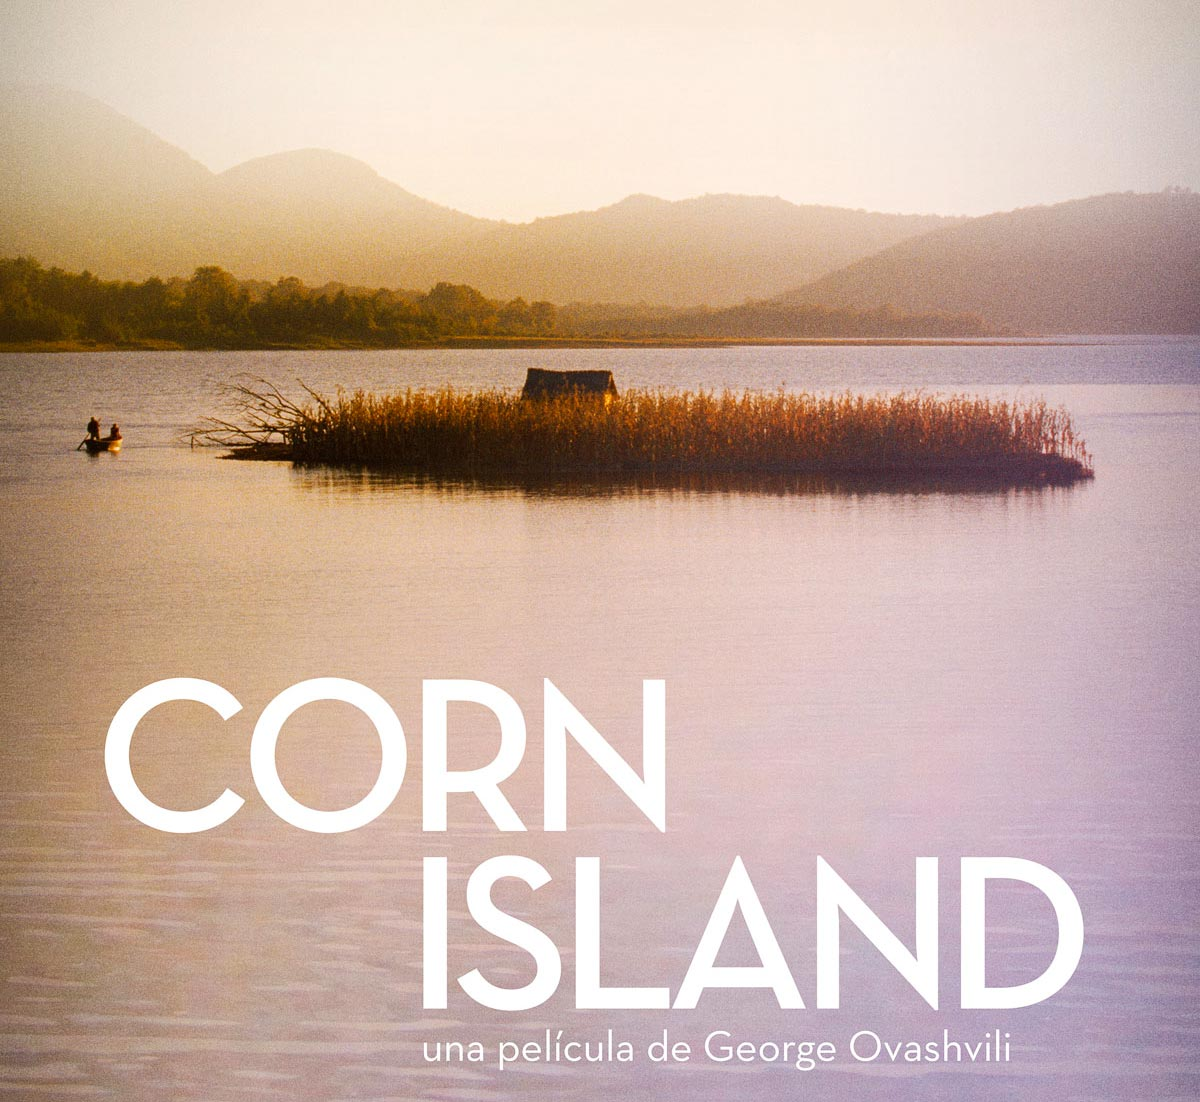 Corn Island,CORN ISLAND película, cine contemplativo, George Ovashvili